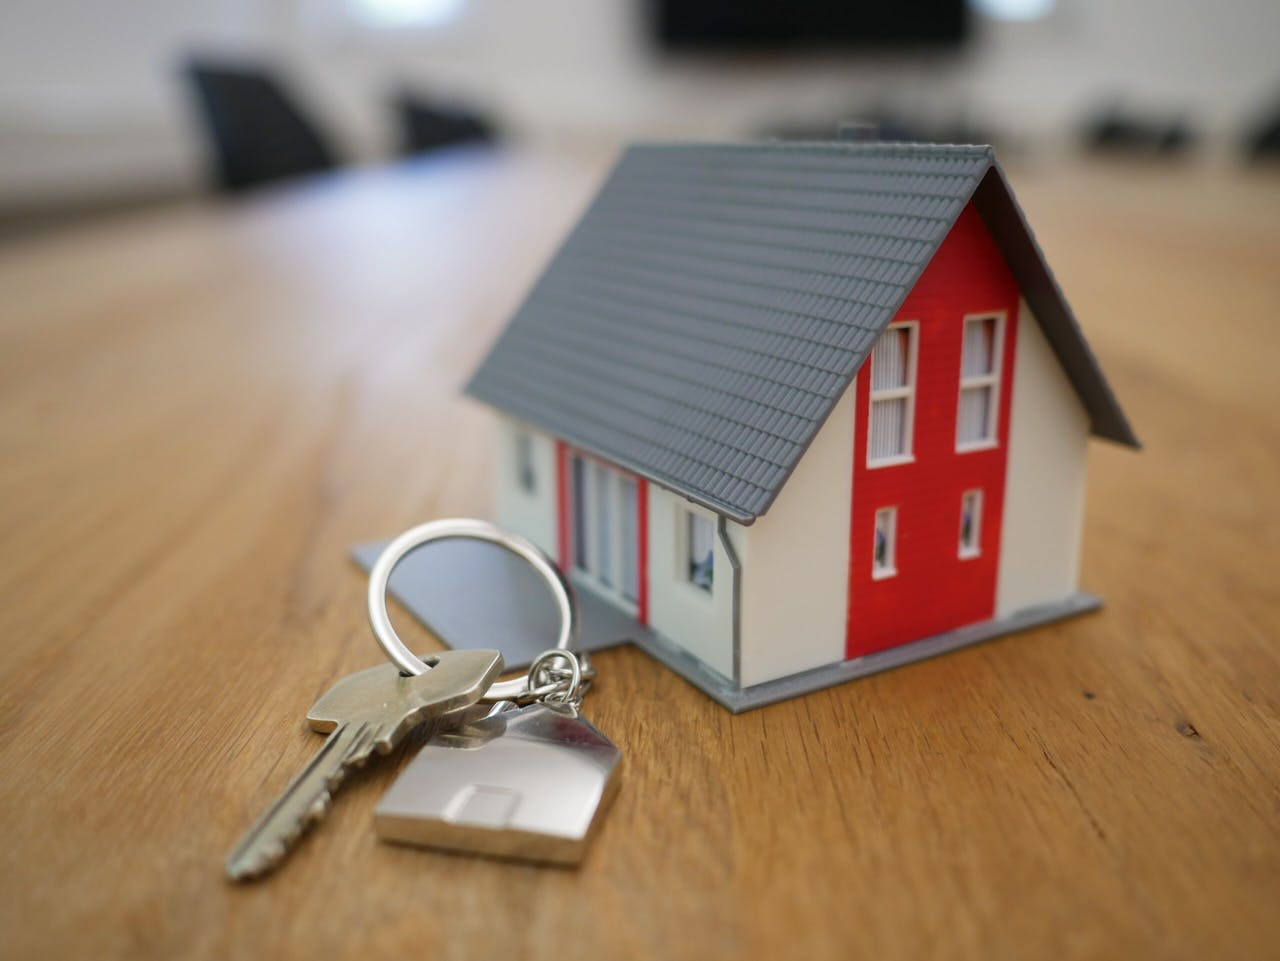 'Hogere rente niet direct oplossing woningcrisis'